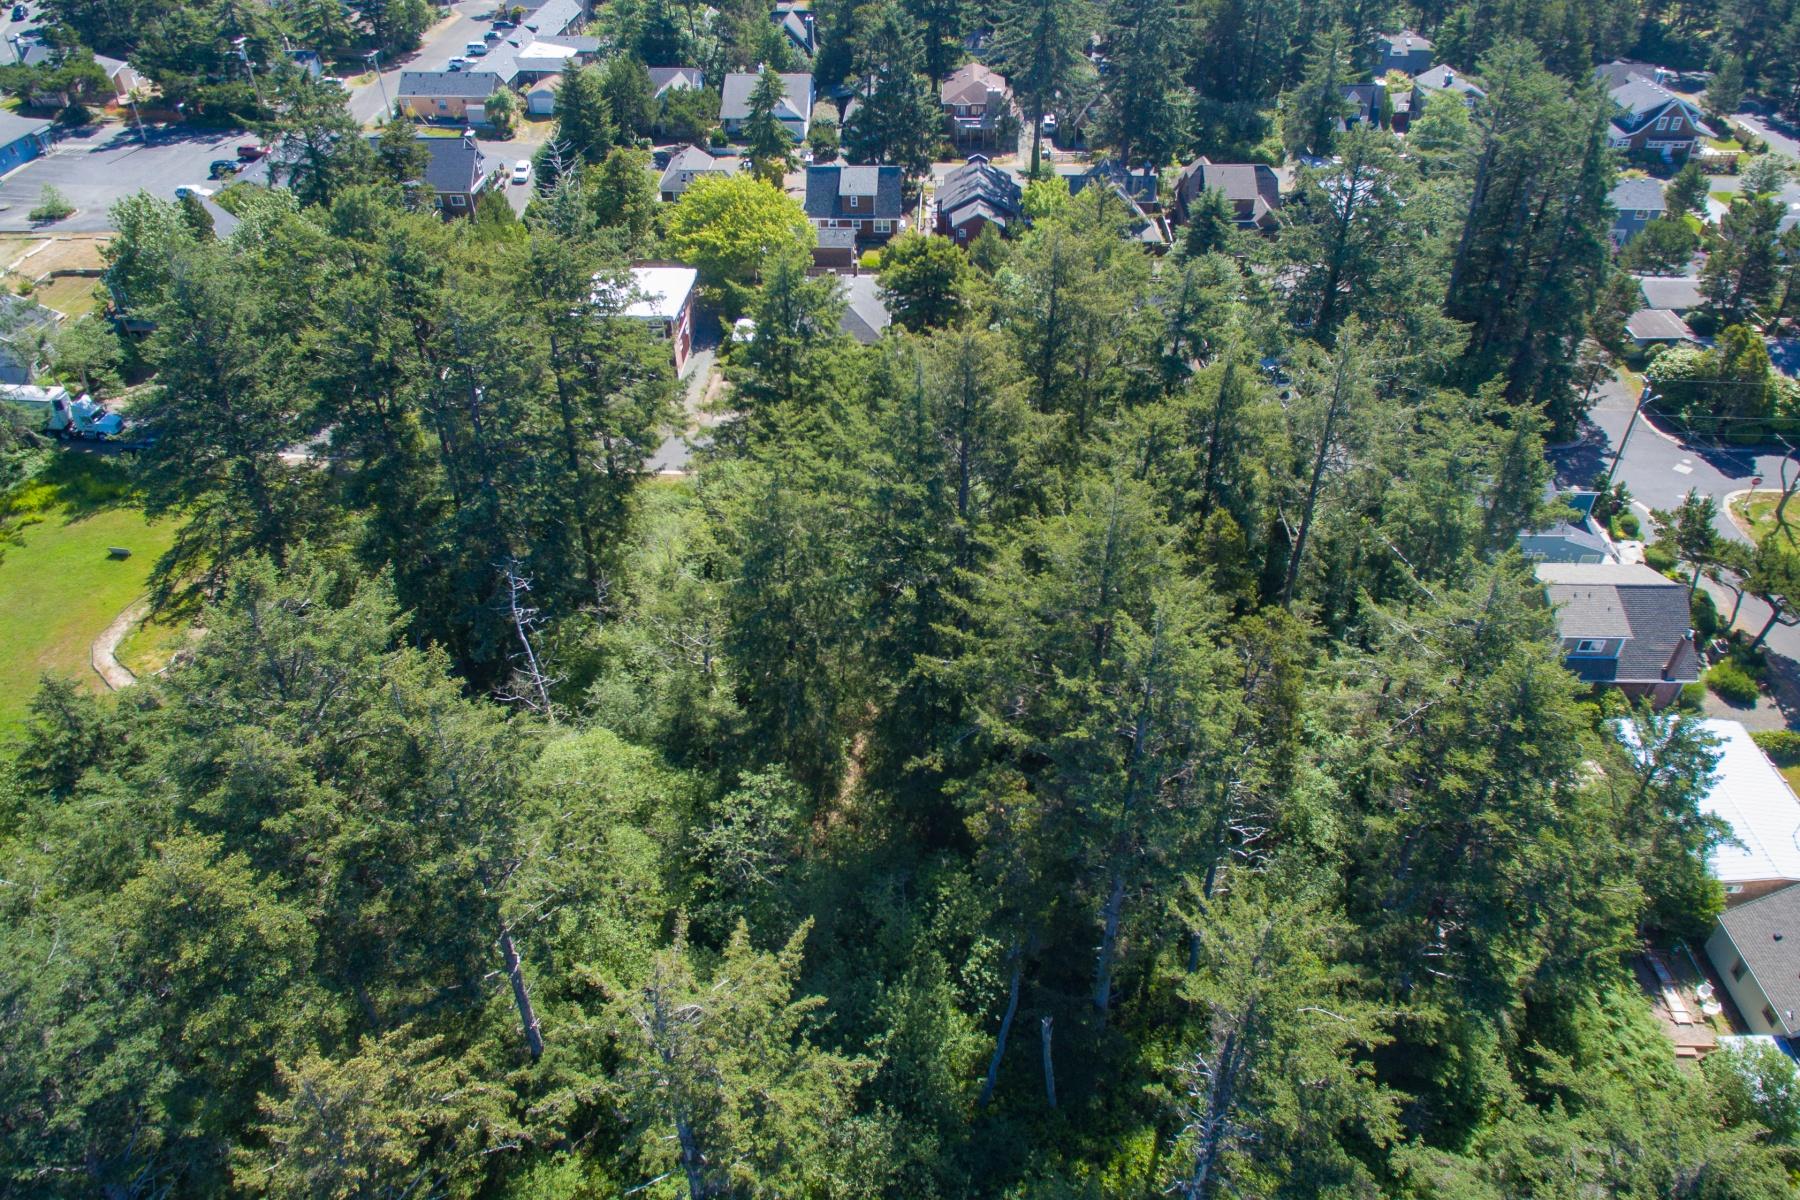 Đất đai vì Bán tại S S Third ST 200, MANZANITA, OR Manzanita, Oregon, 97130 Hoa Kỳ